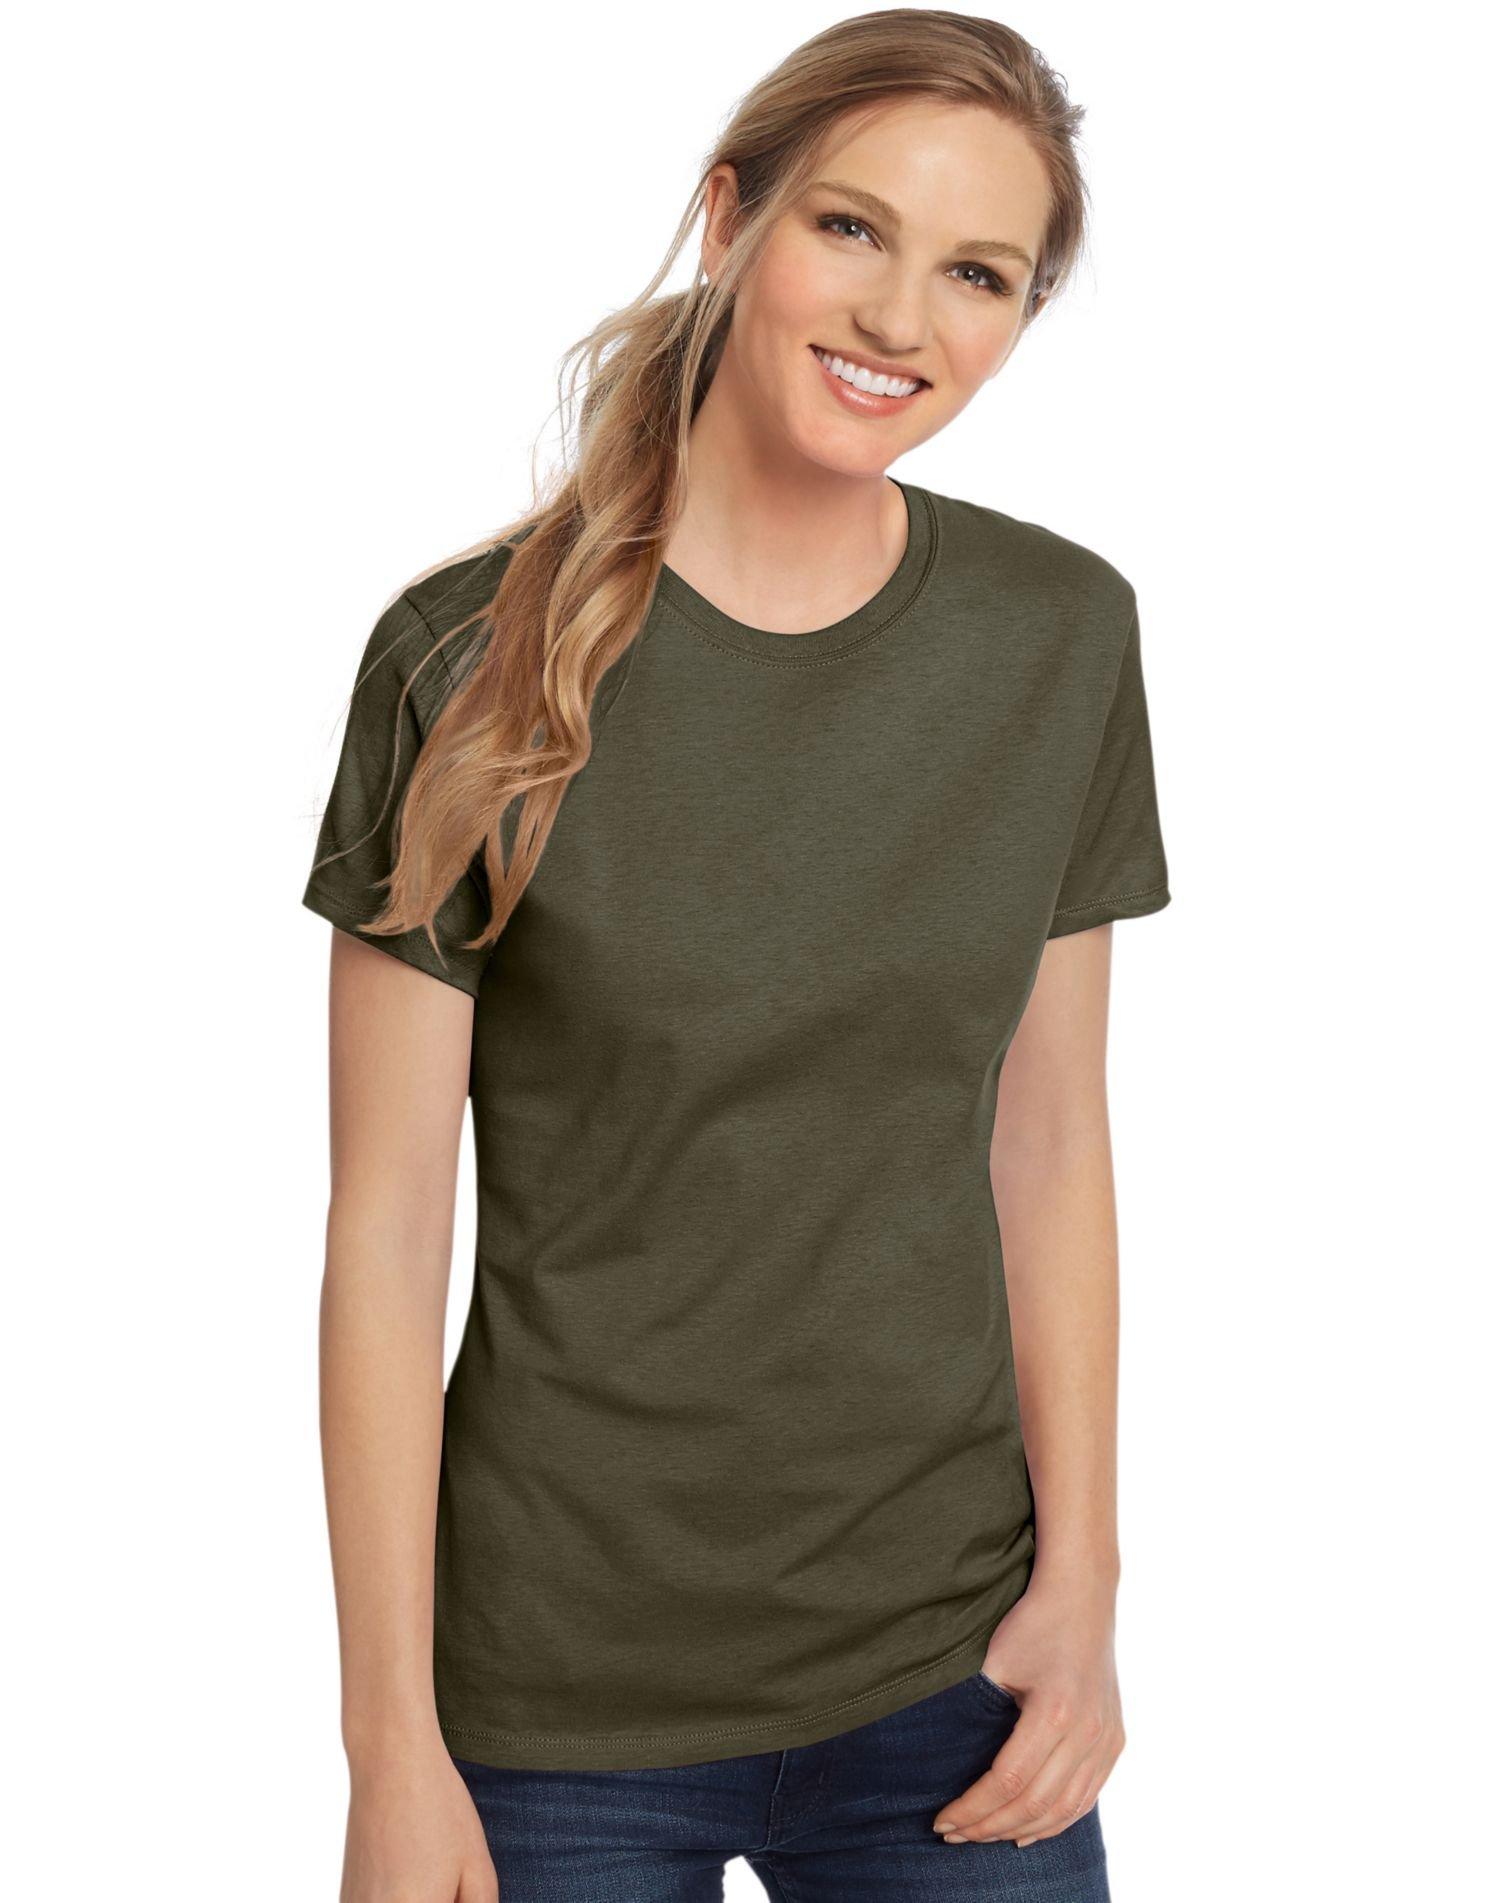 Hanes Womens 100% Ringspun Cotton Nano-T T-Shirt (SL04) -Fatigue GR -M